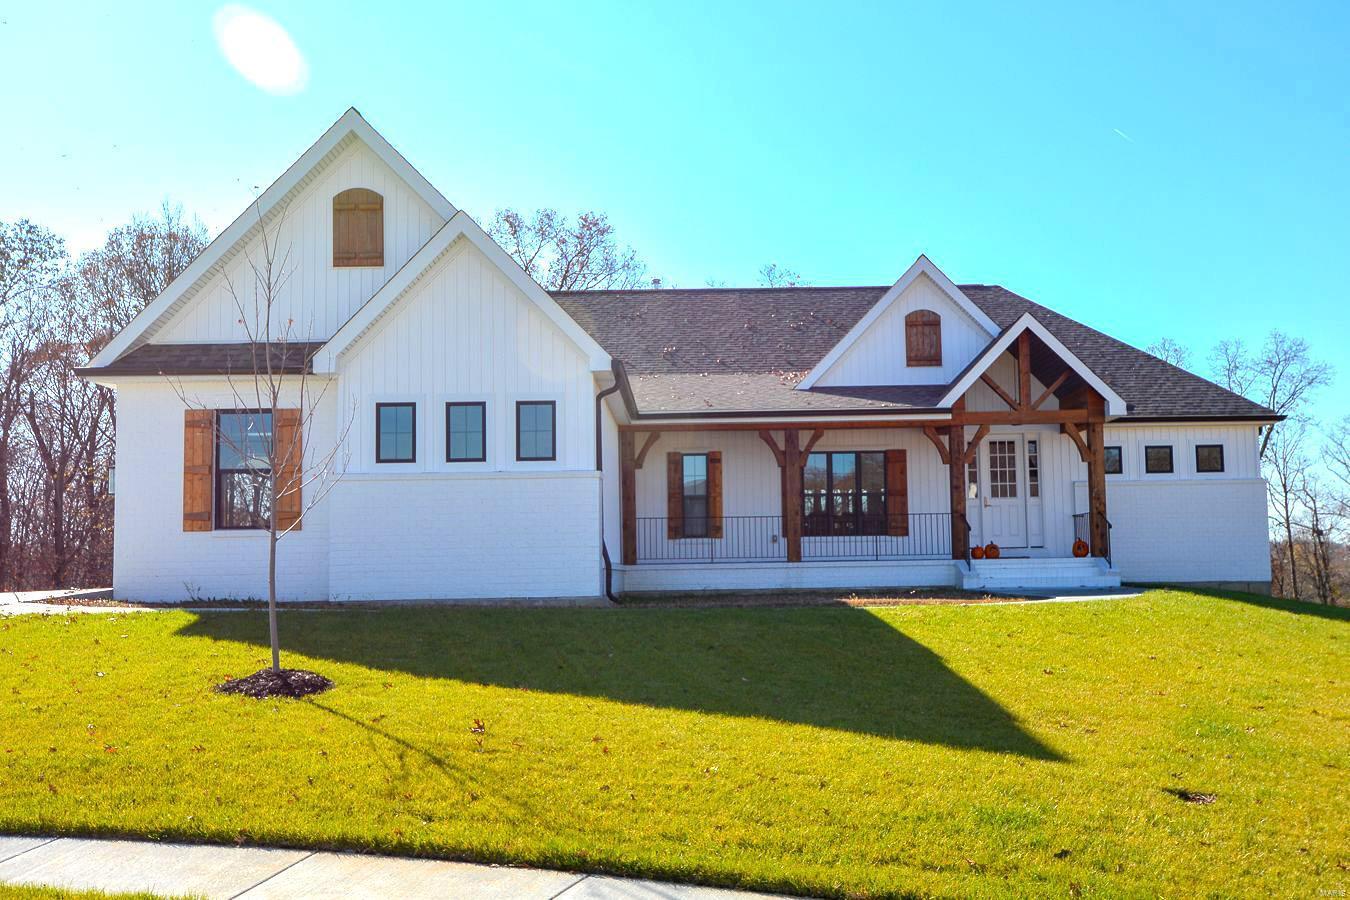 19261 TBB Melrose Property Photo - Wildwood, MO real estate listing